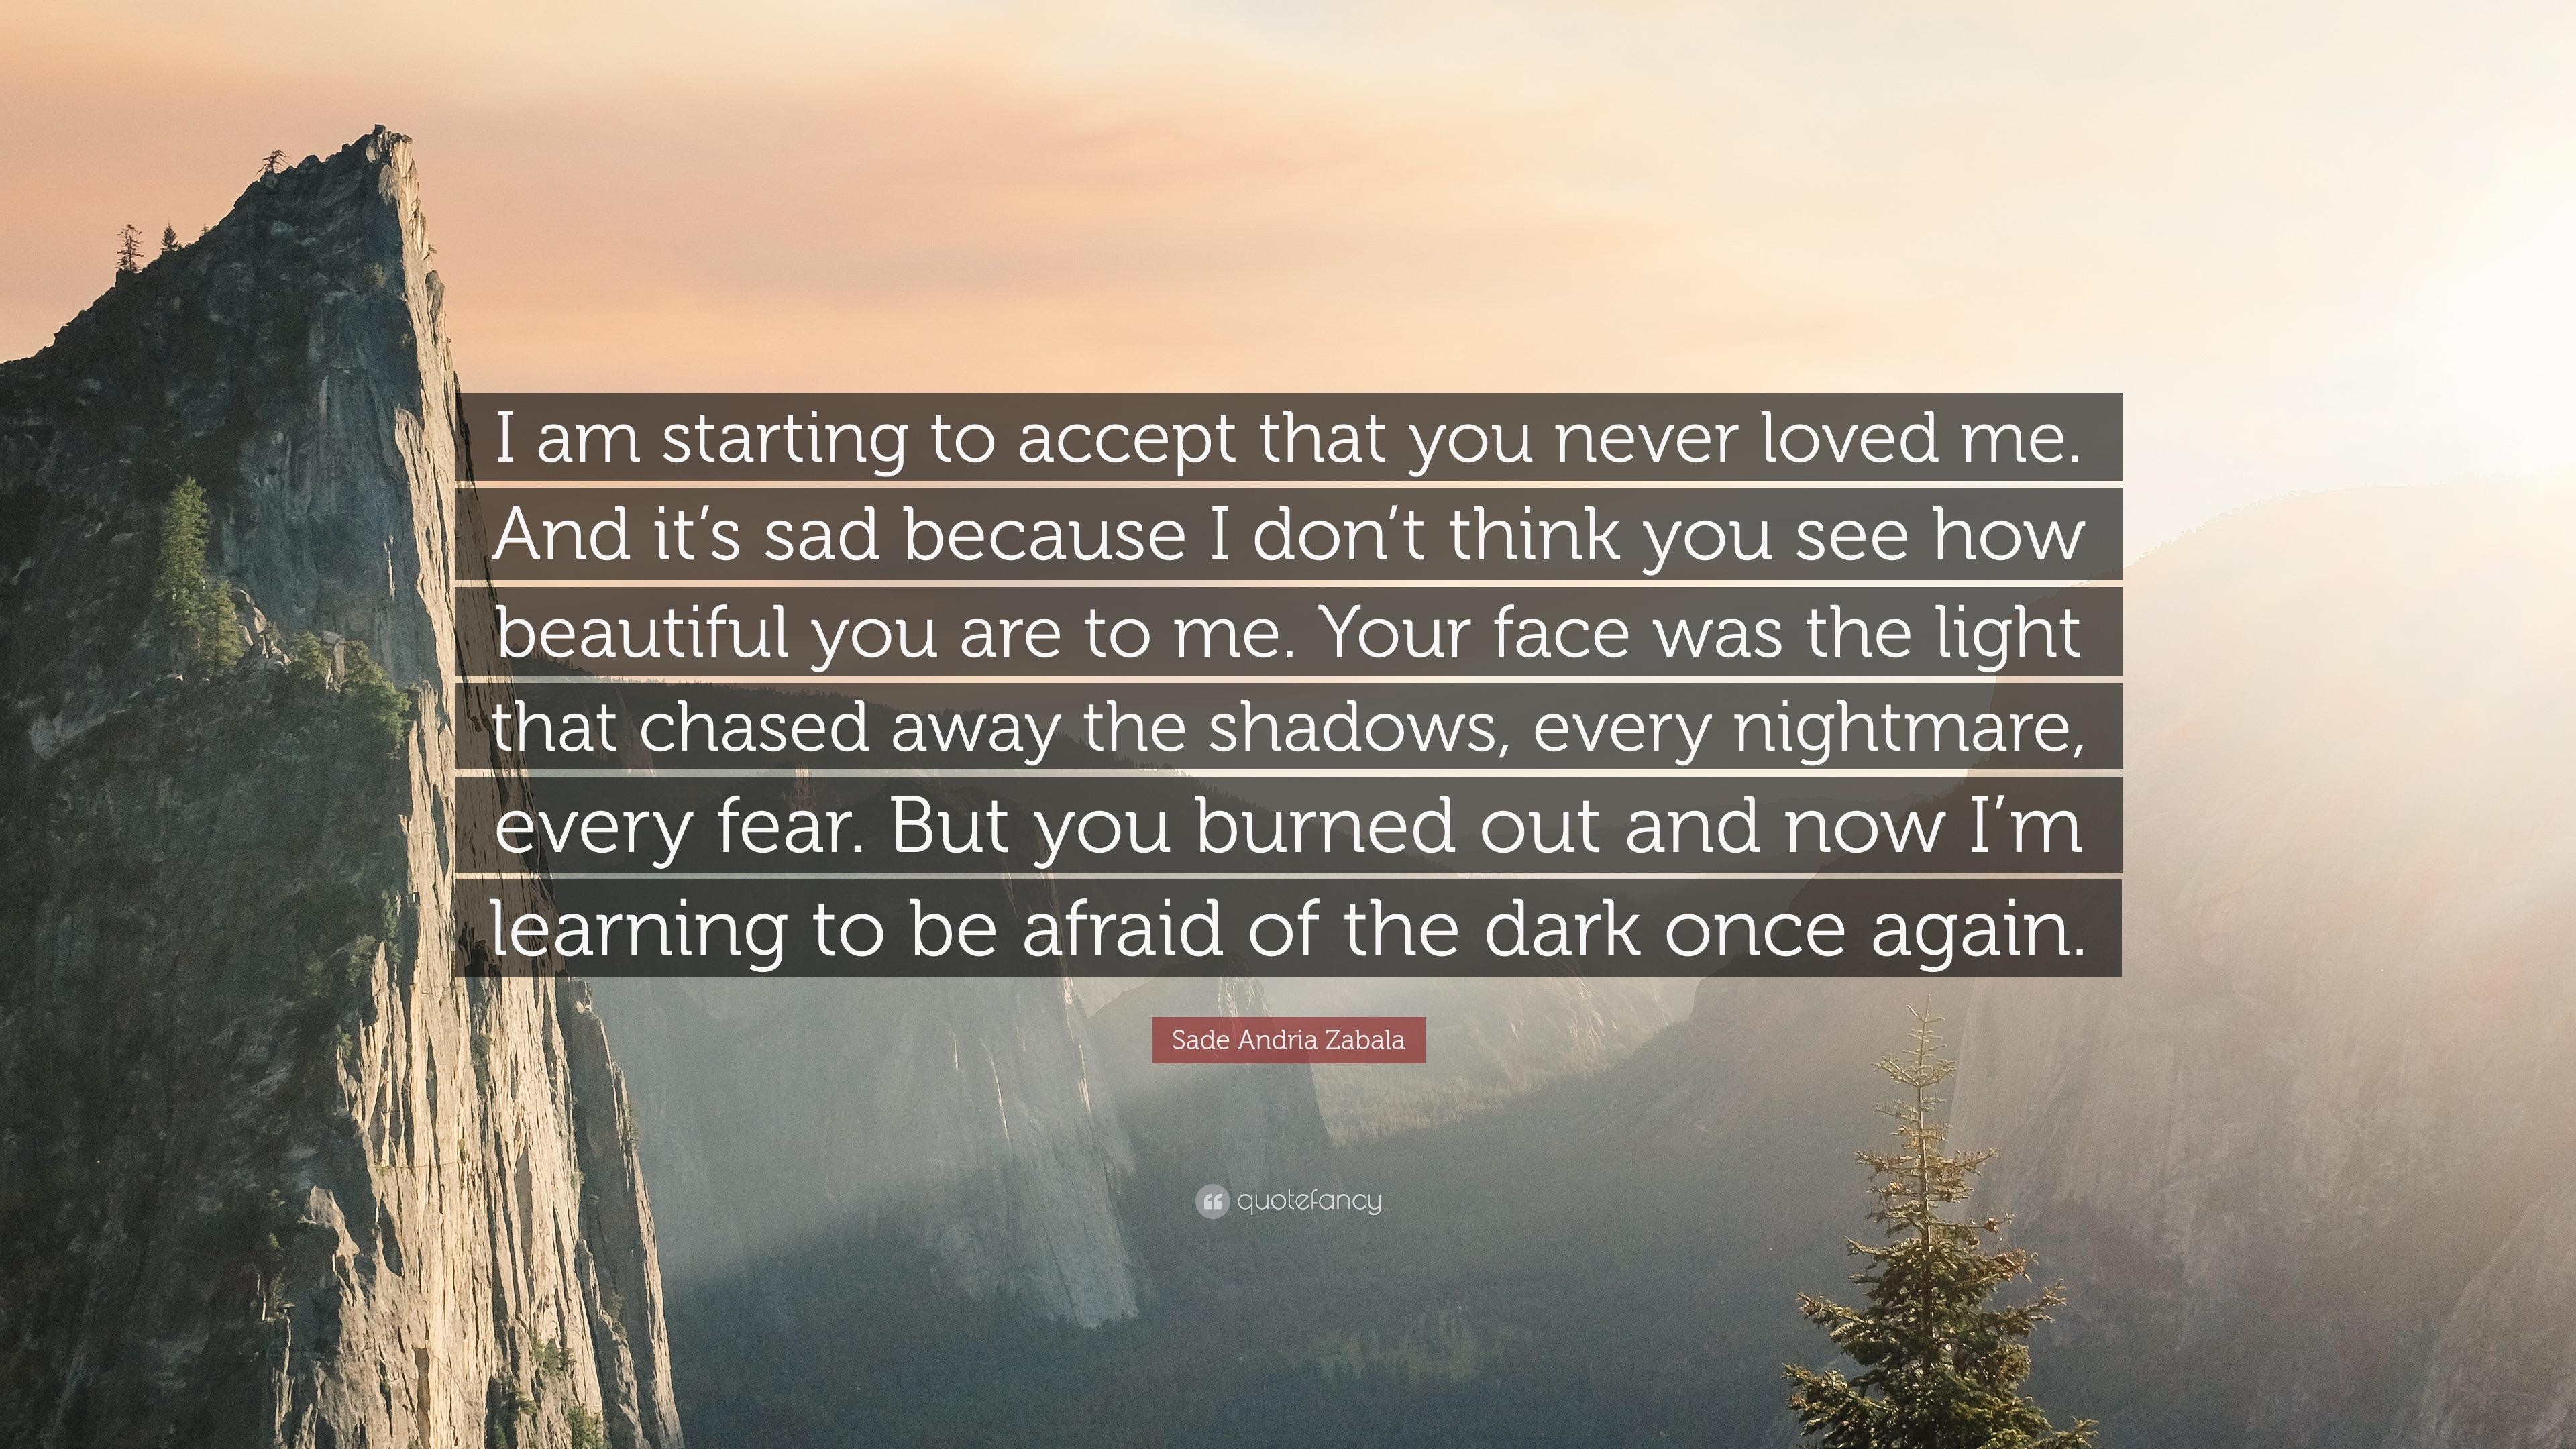 sade andria zabala quote i am starting to accept that you never sade andria zabala quote i am starting to accept that you never loved me